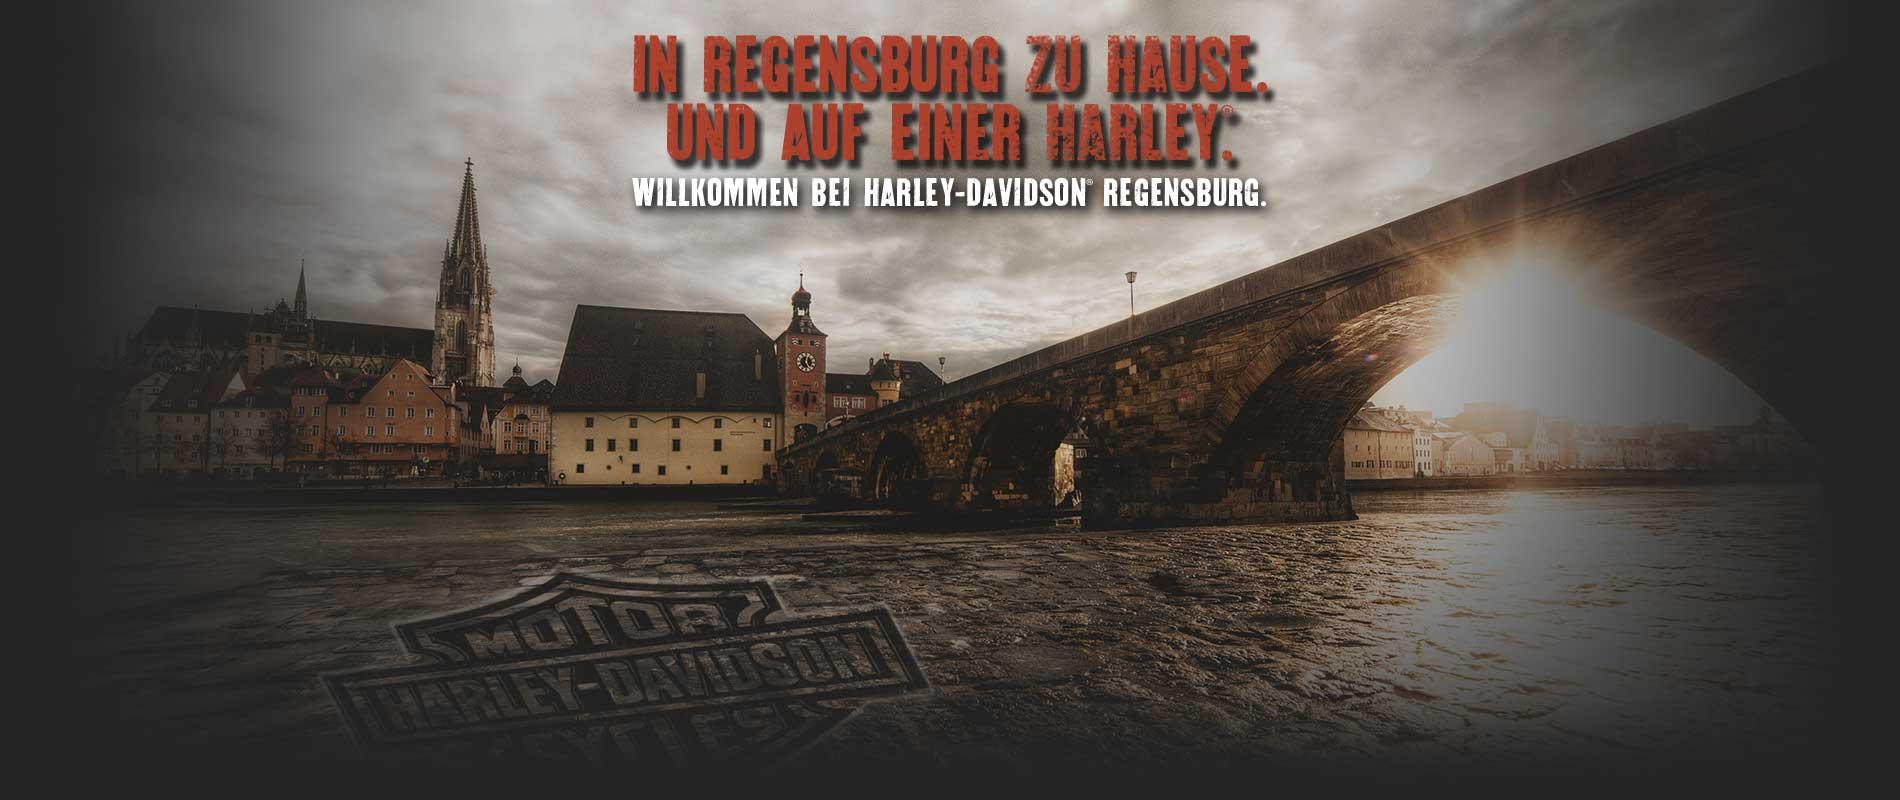 HD_Regensburg_Billboard_Wiedereroeffnung3